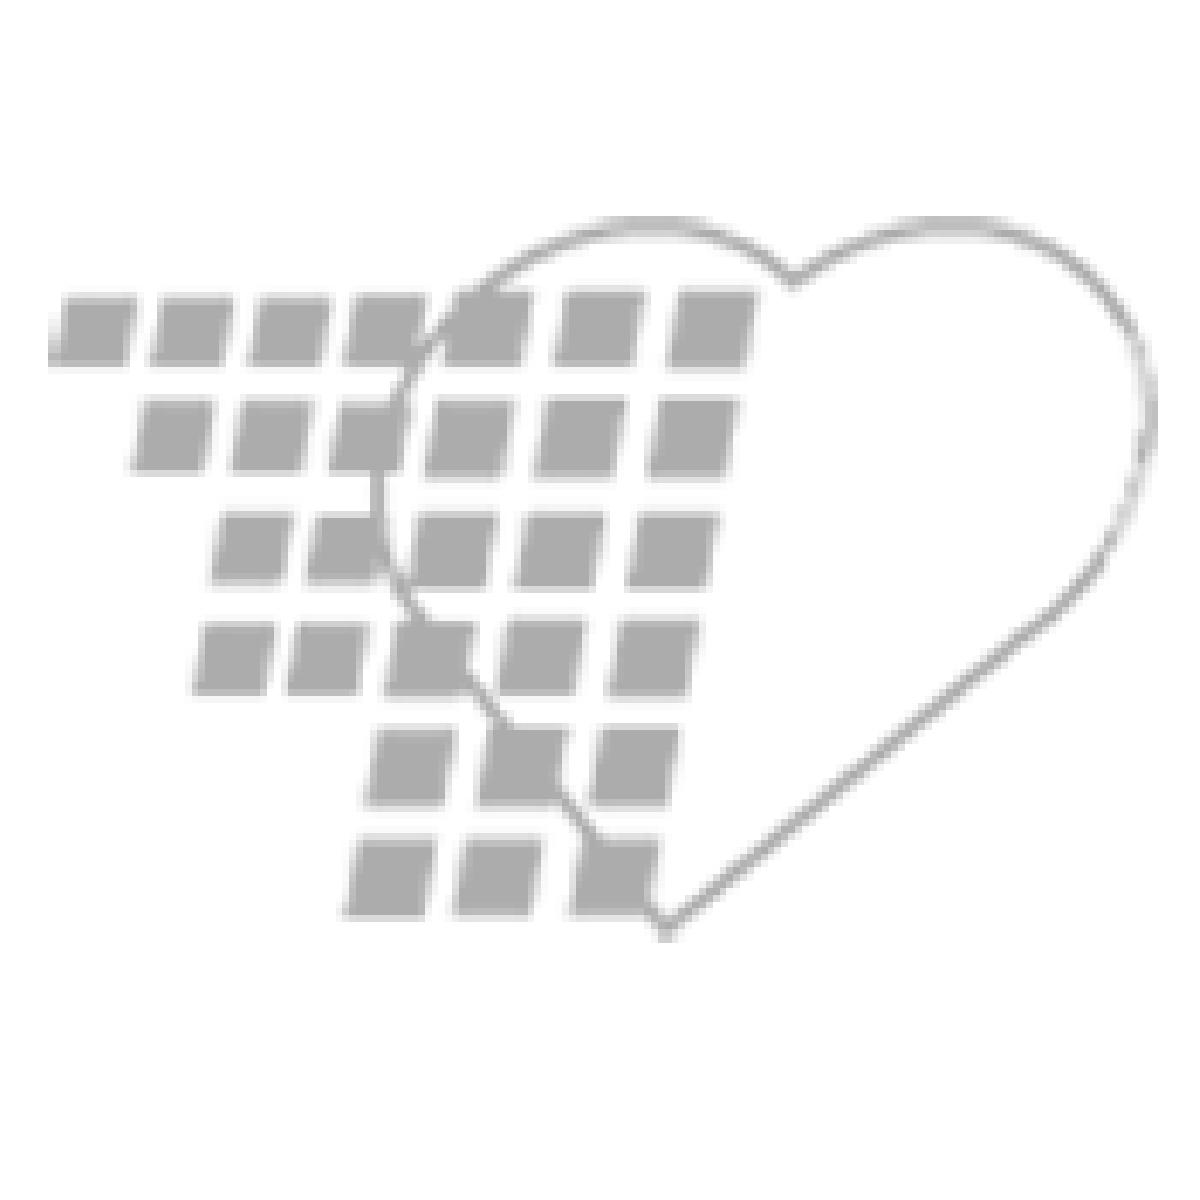 02-99-0048 Bulb 2.5V Laryngoscope Replacement for WA 04800